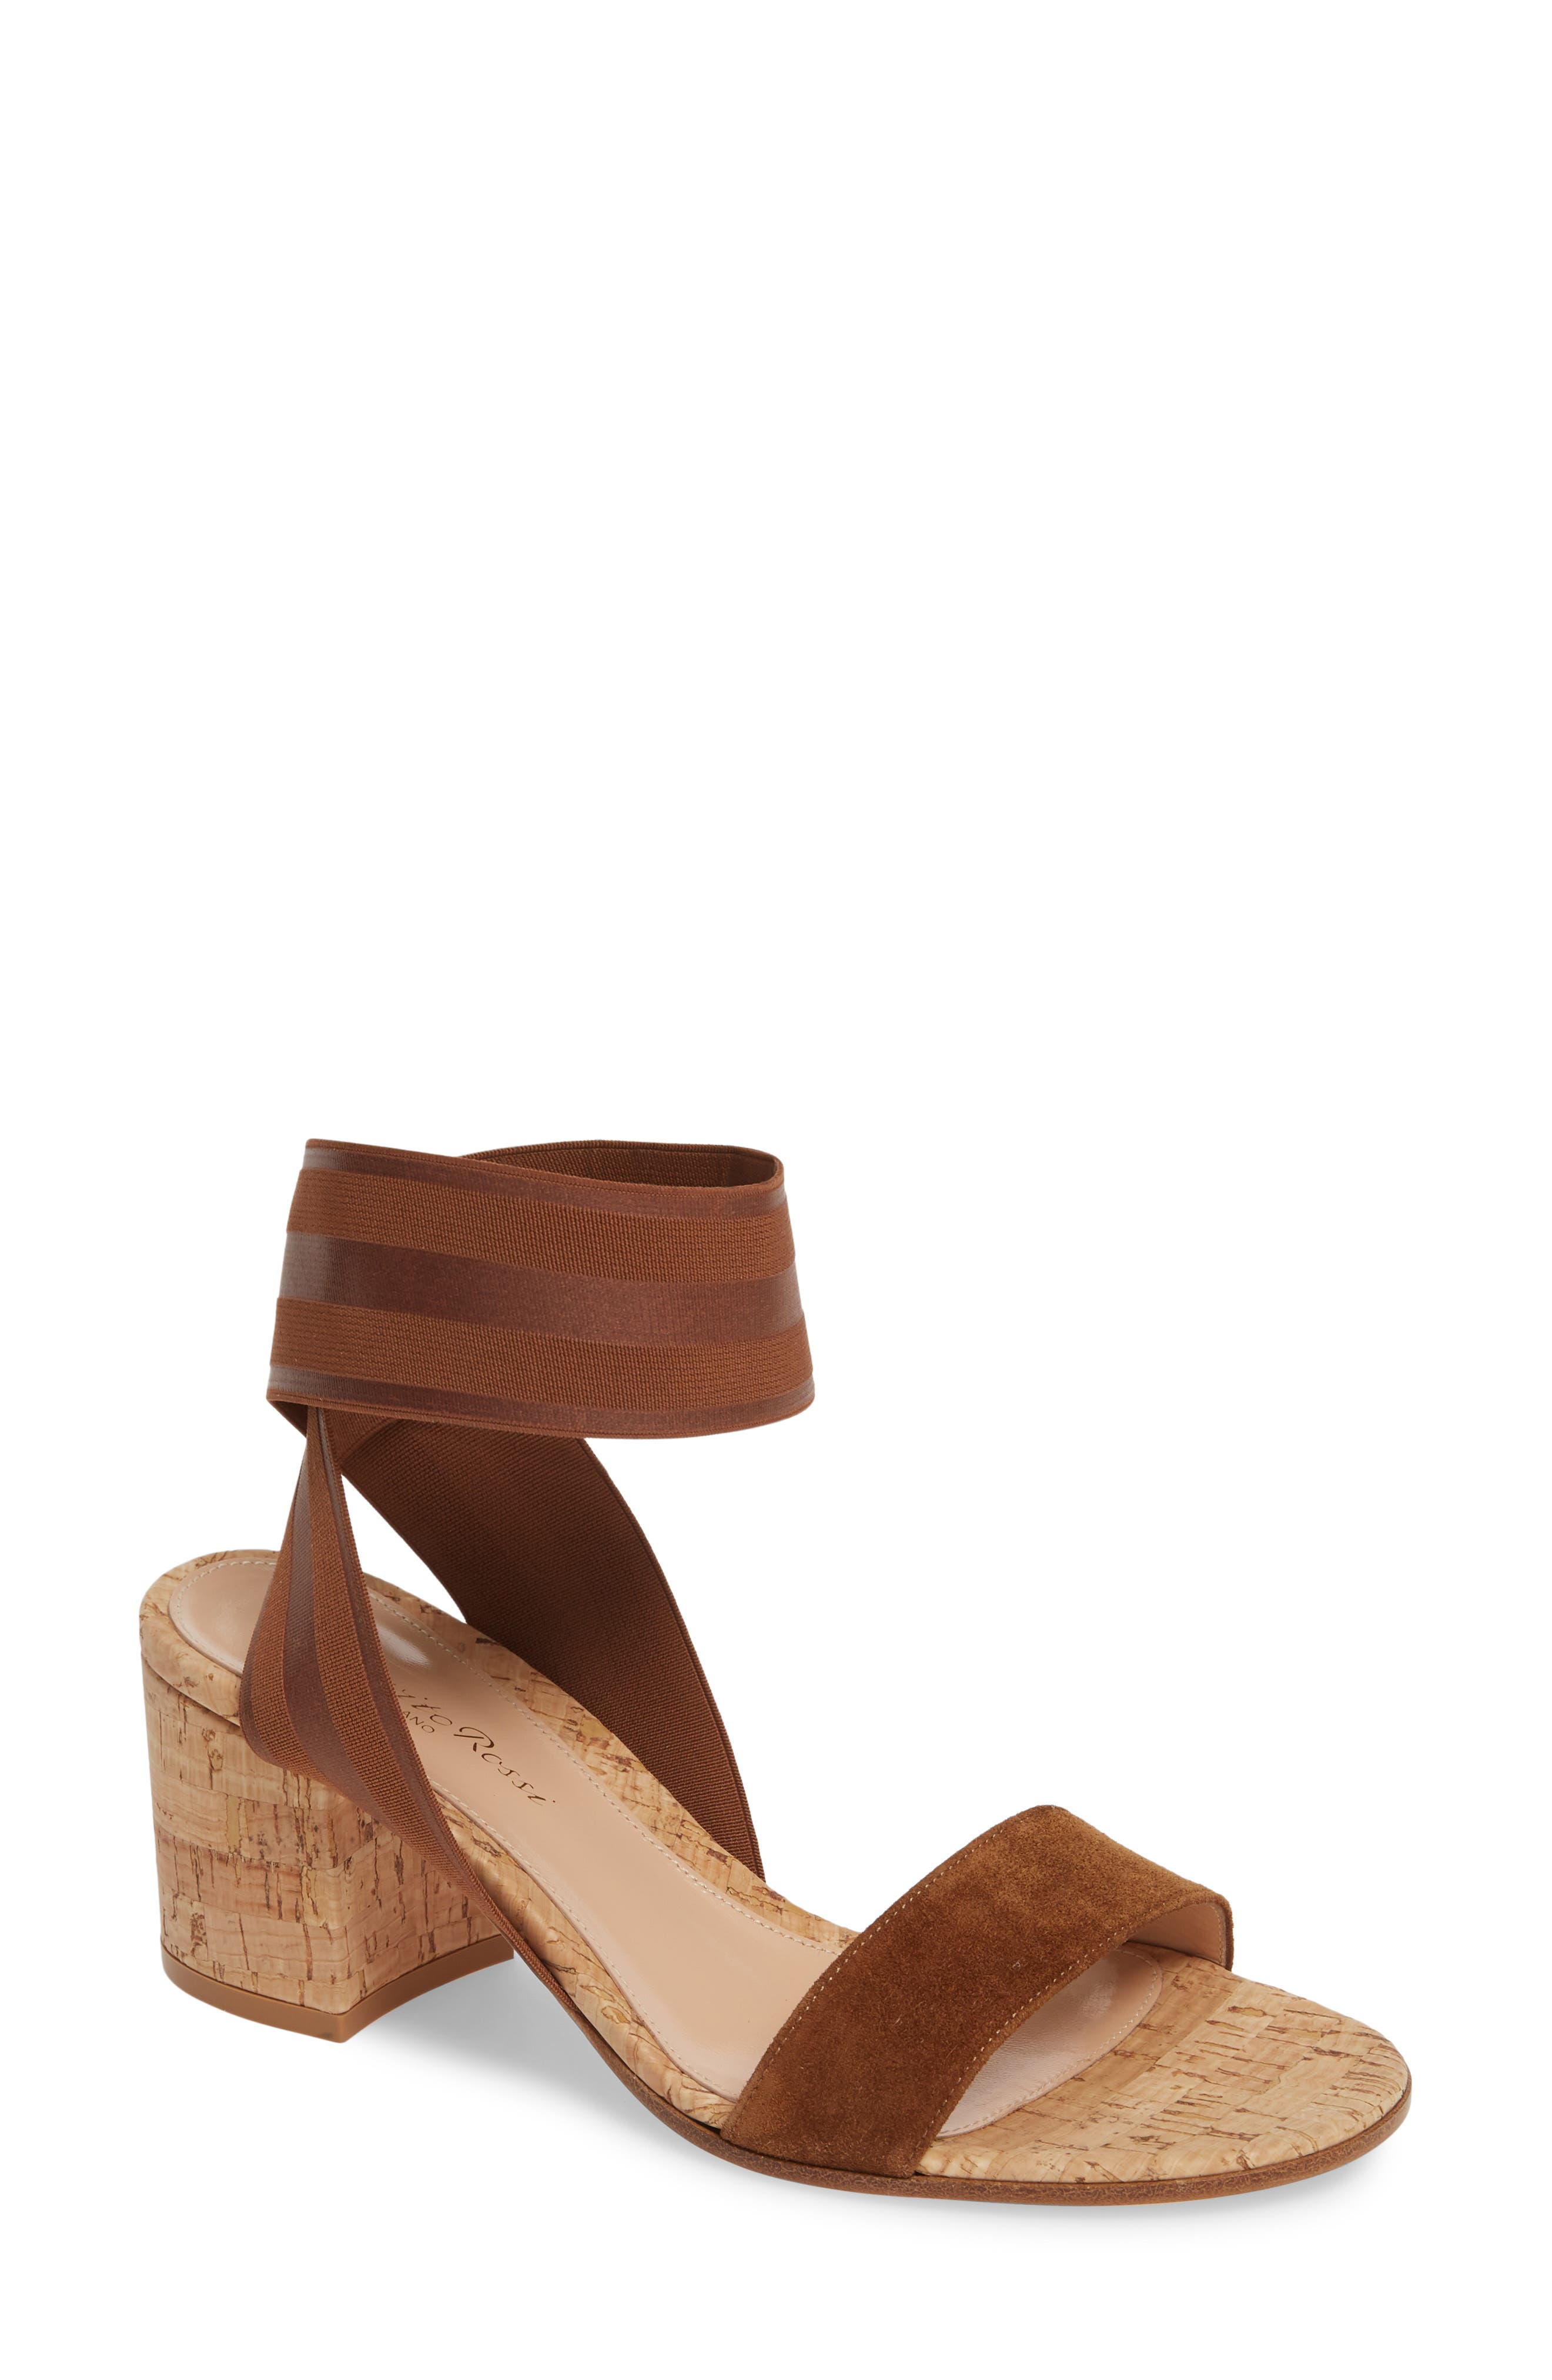 Gianvito Rossi Cork Heel Sandal - Brown